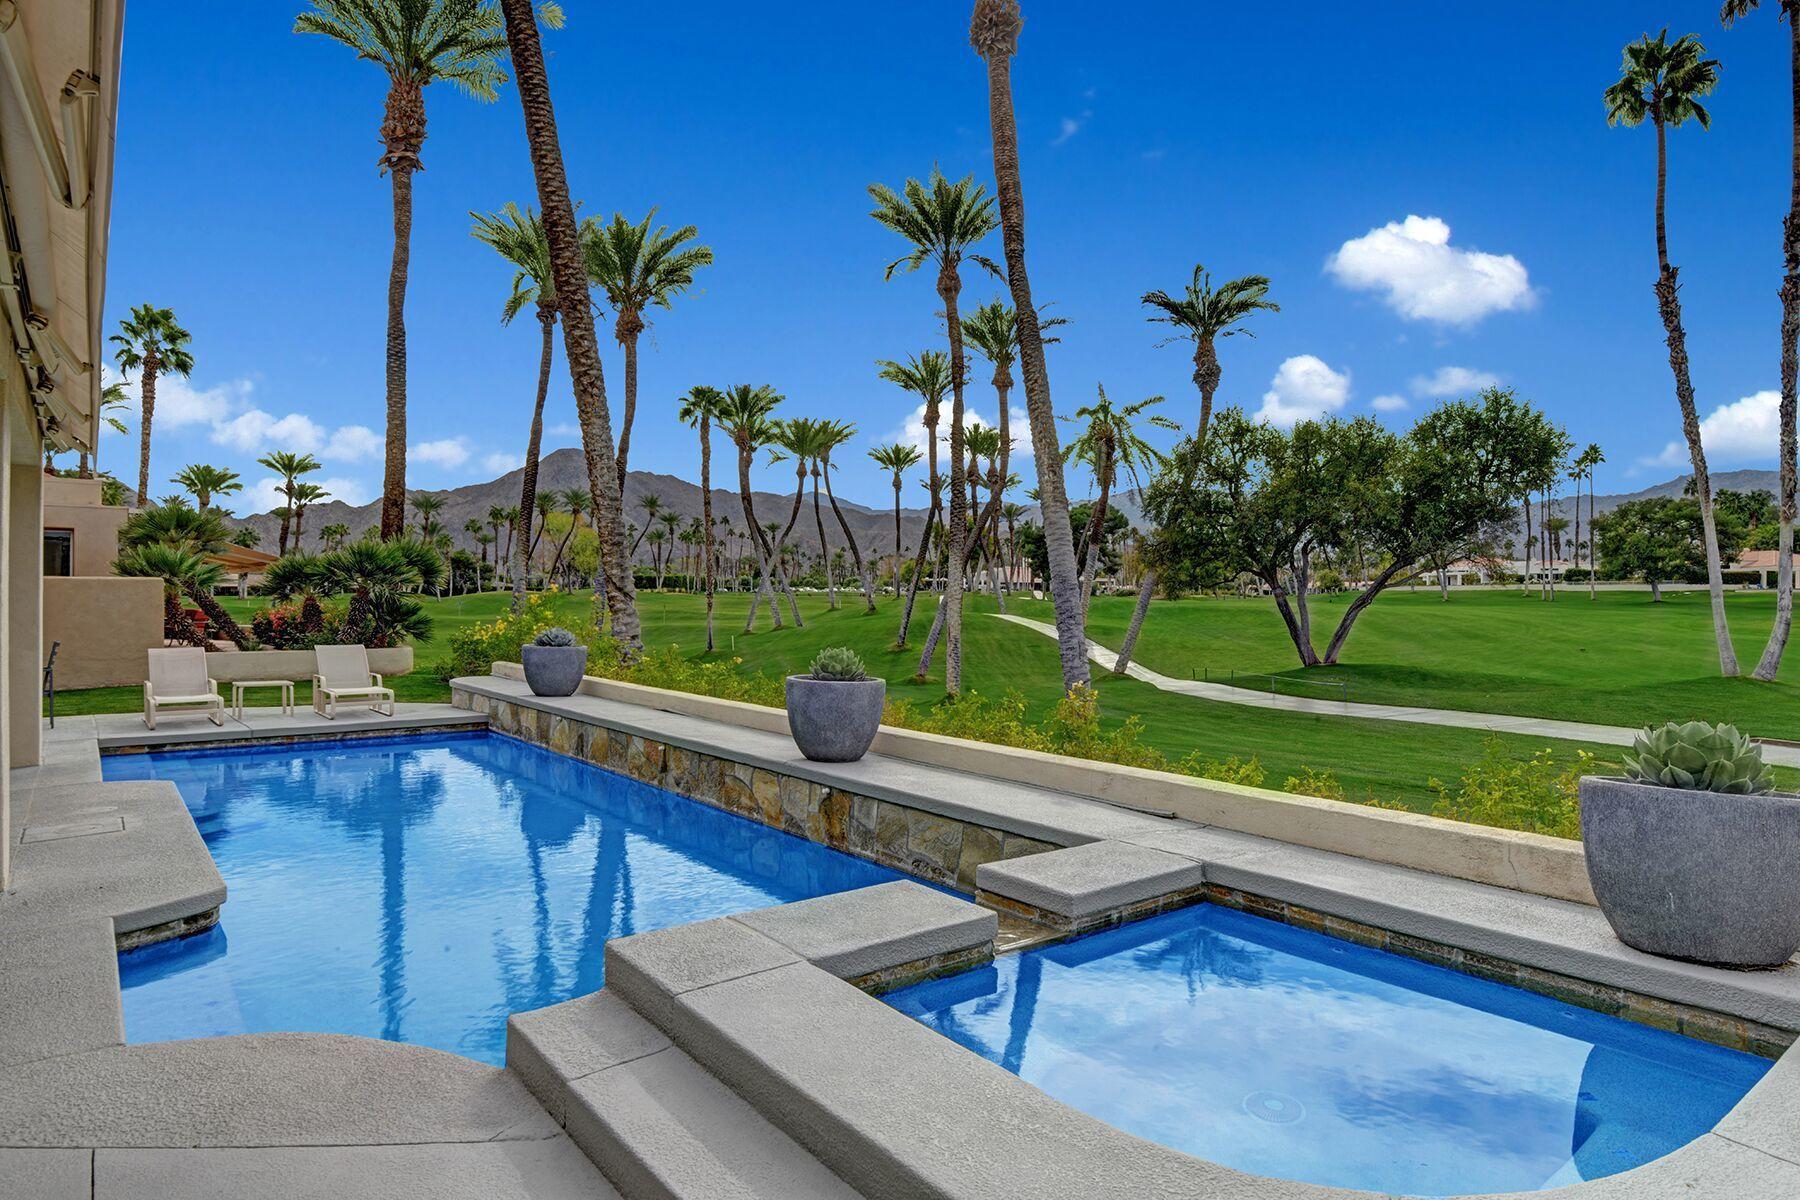 44838 Santa Rosa Court, Indian Wells, California 92210, 3 Bedrooms Bedrooms, ,3 BathroomsBathrooms,Residential,For Sale,44838 Santa Rosa Court,219037647